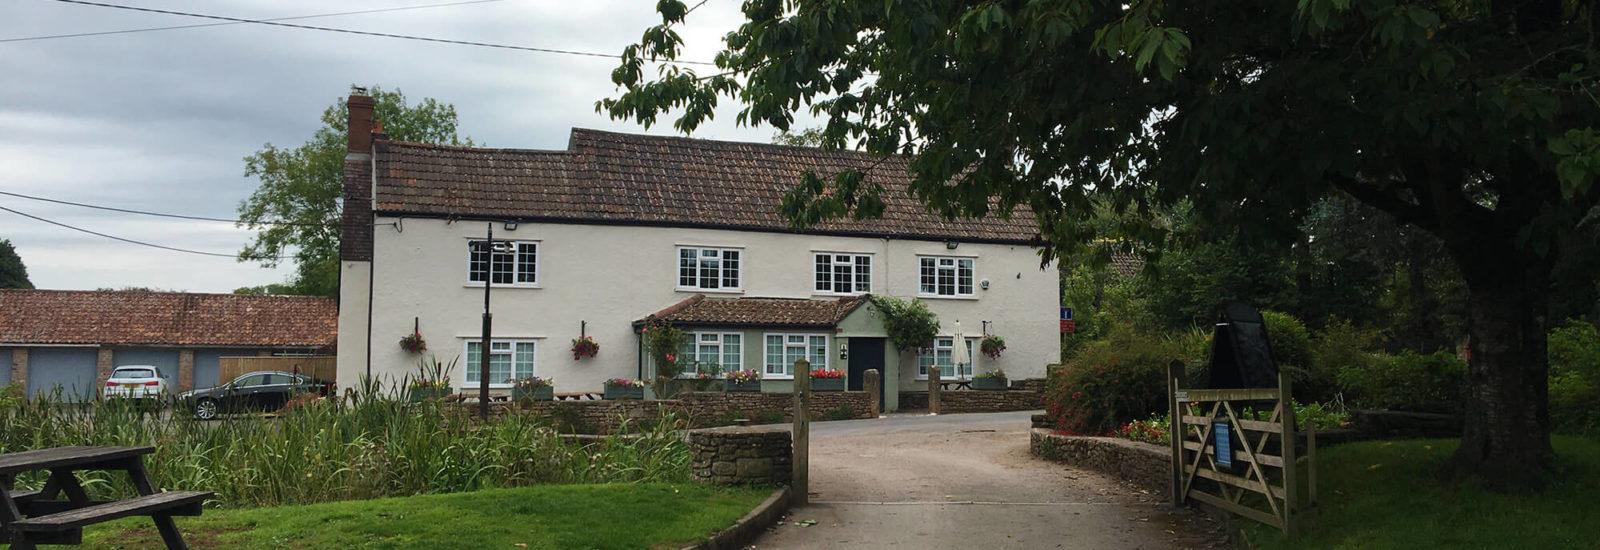 Image of The Swan Inn Rowberrow